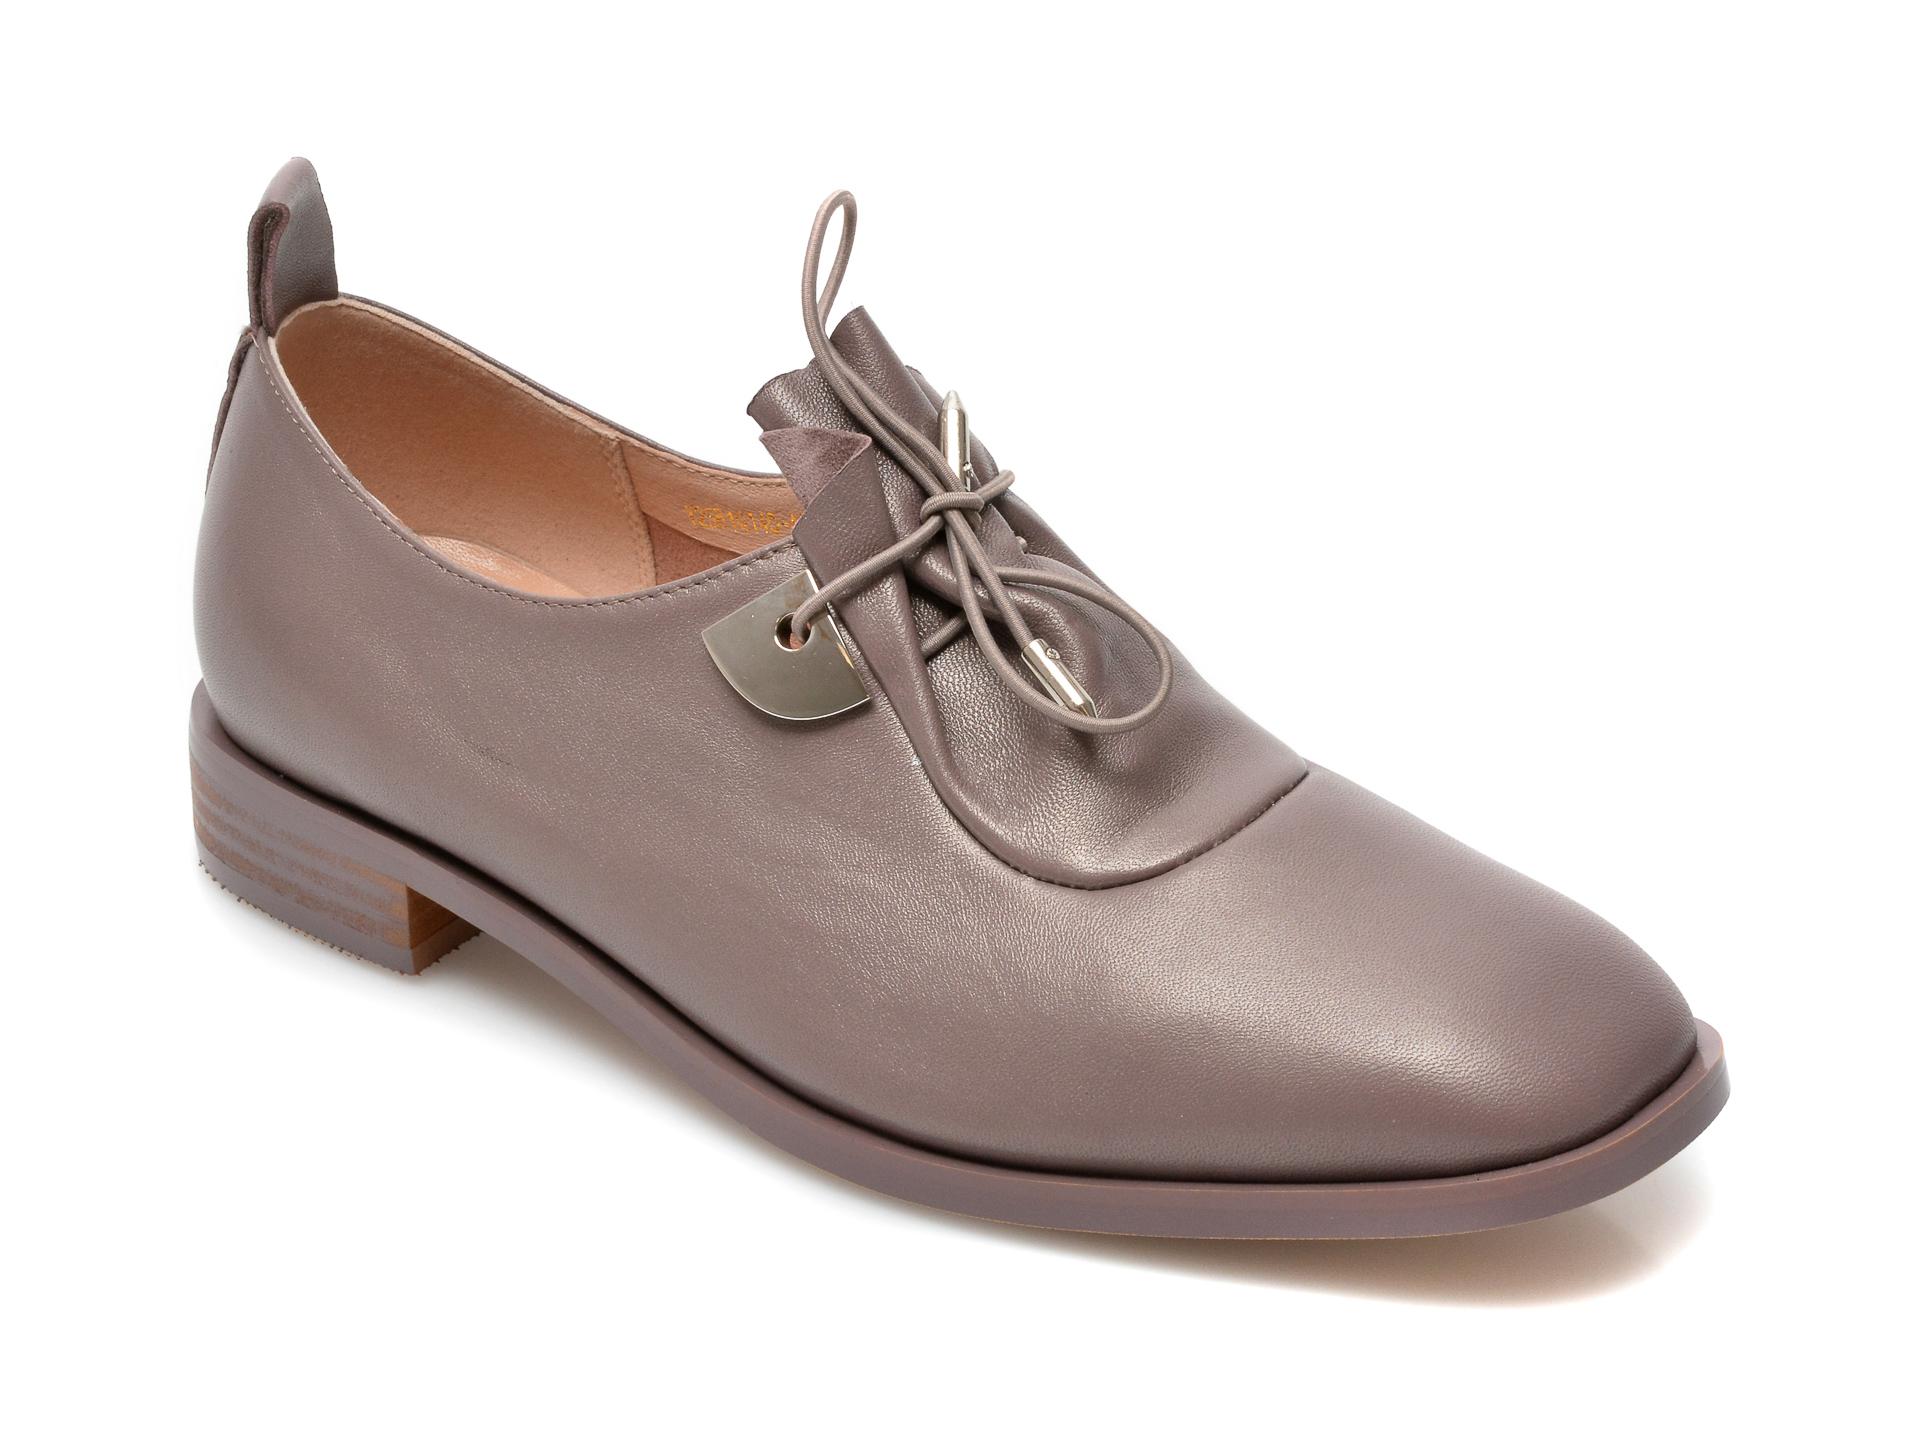 Pantofi EPICA gri, Y2561Q1, din piele naturala imagine otter.ro 2021